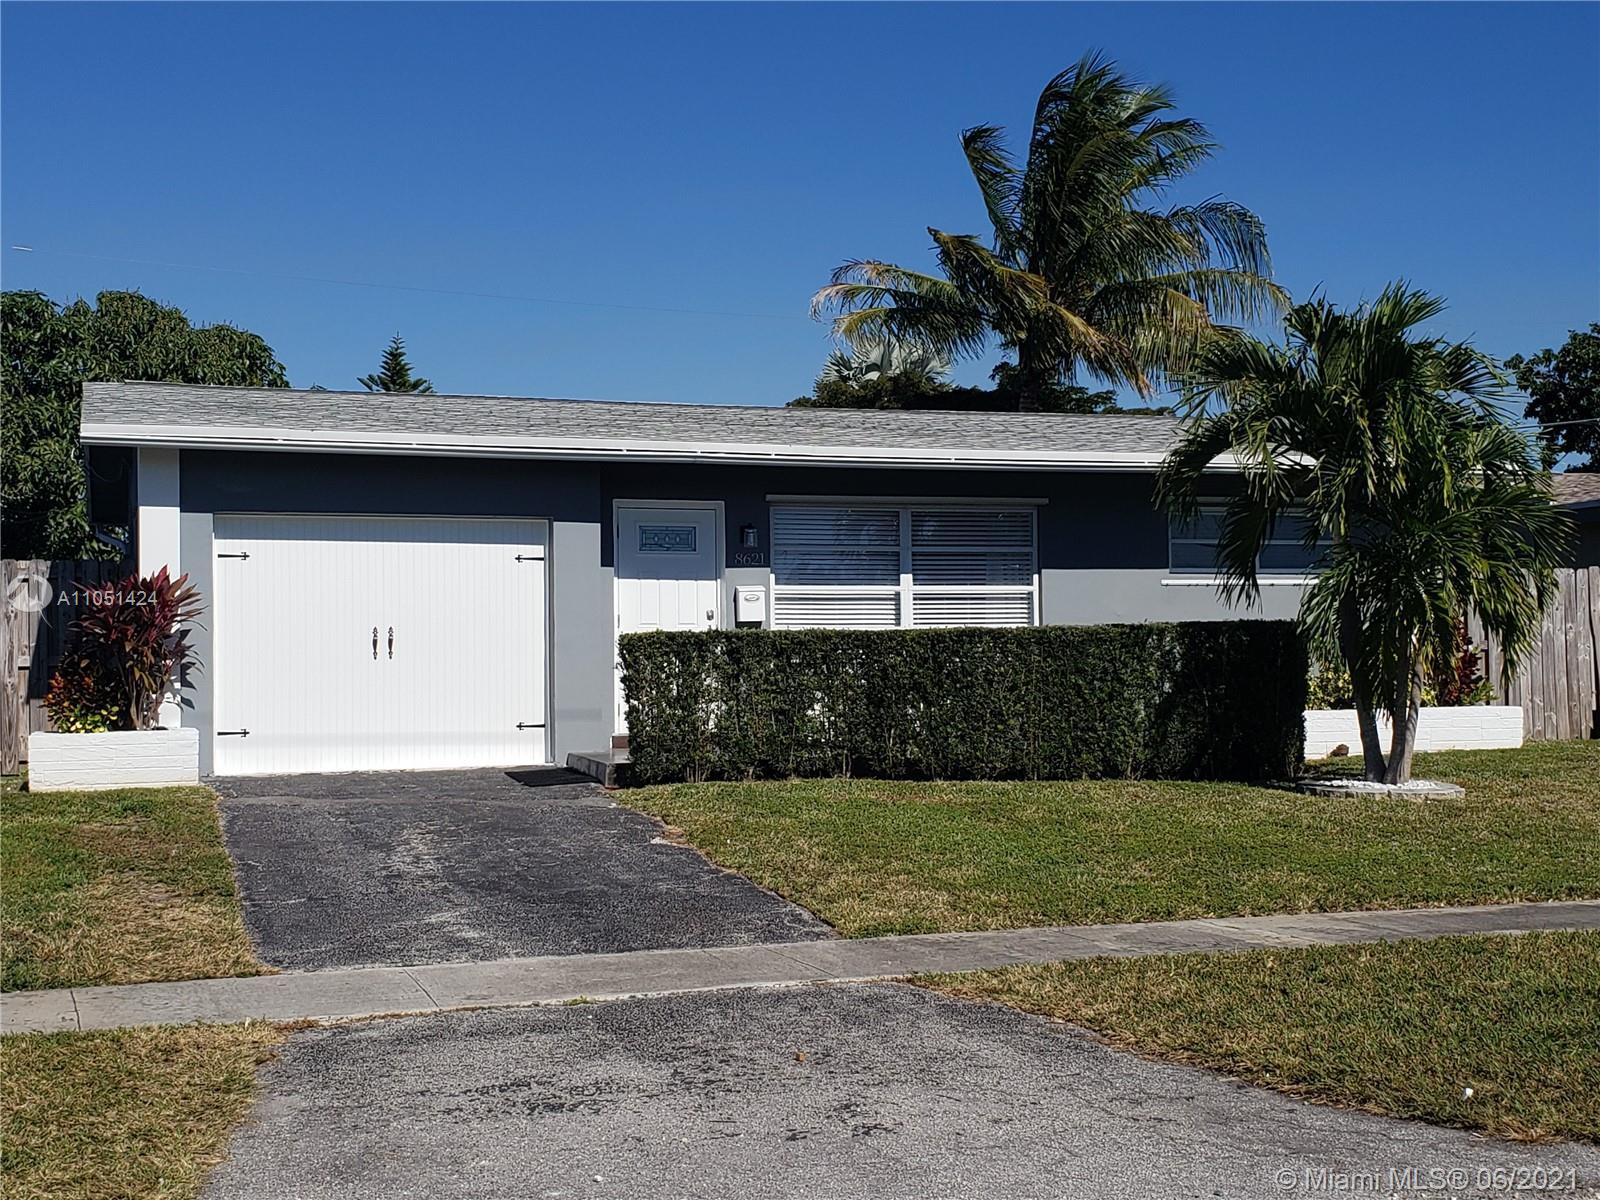 Sunrise Golf Village - 8621 NW 25th Ct, Sunrise, FL 33322